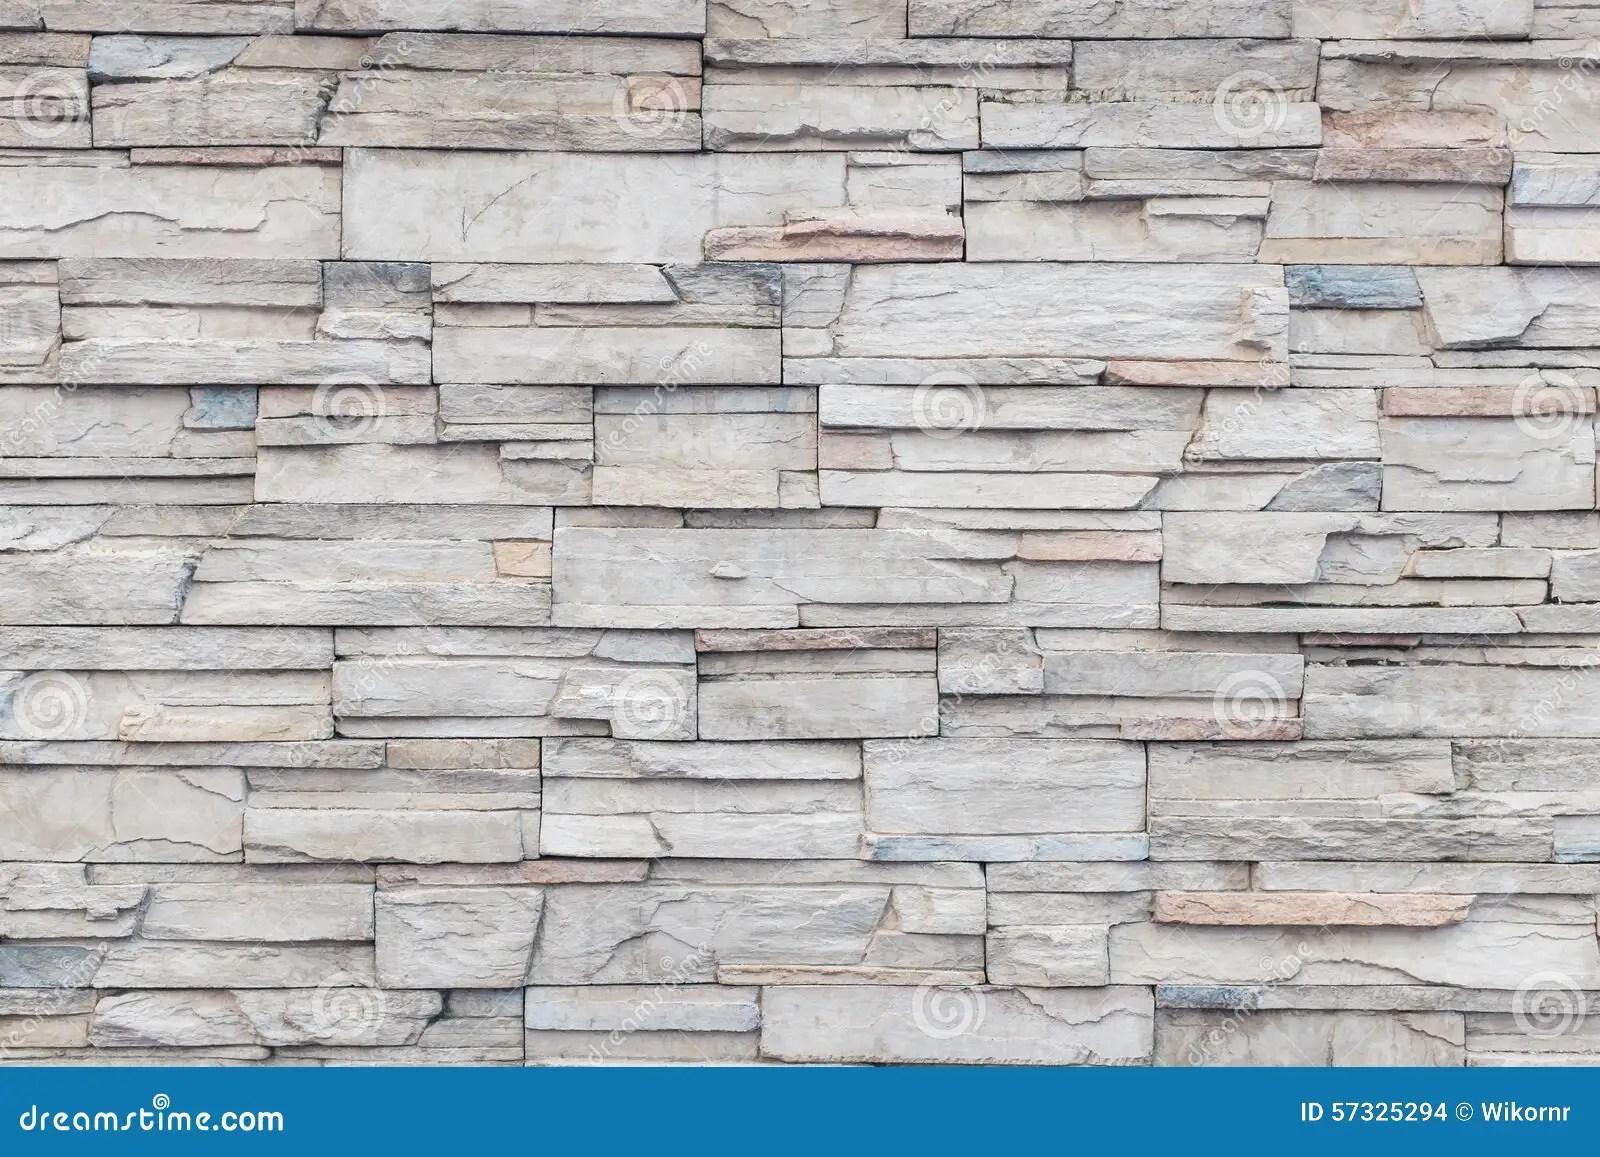 Wallpaper Batu Alam 3d Marble Brick Wall Texture Stock Photo Image 57325294